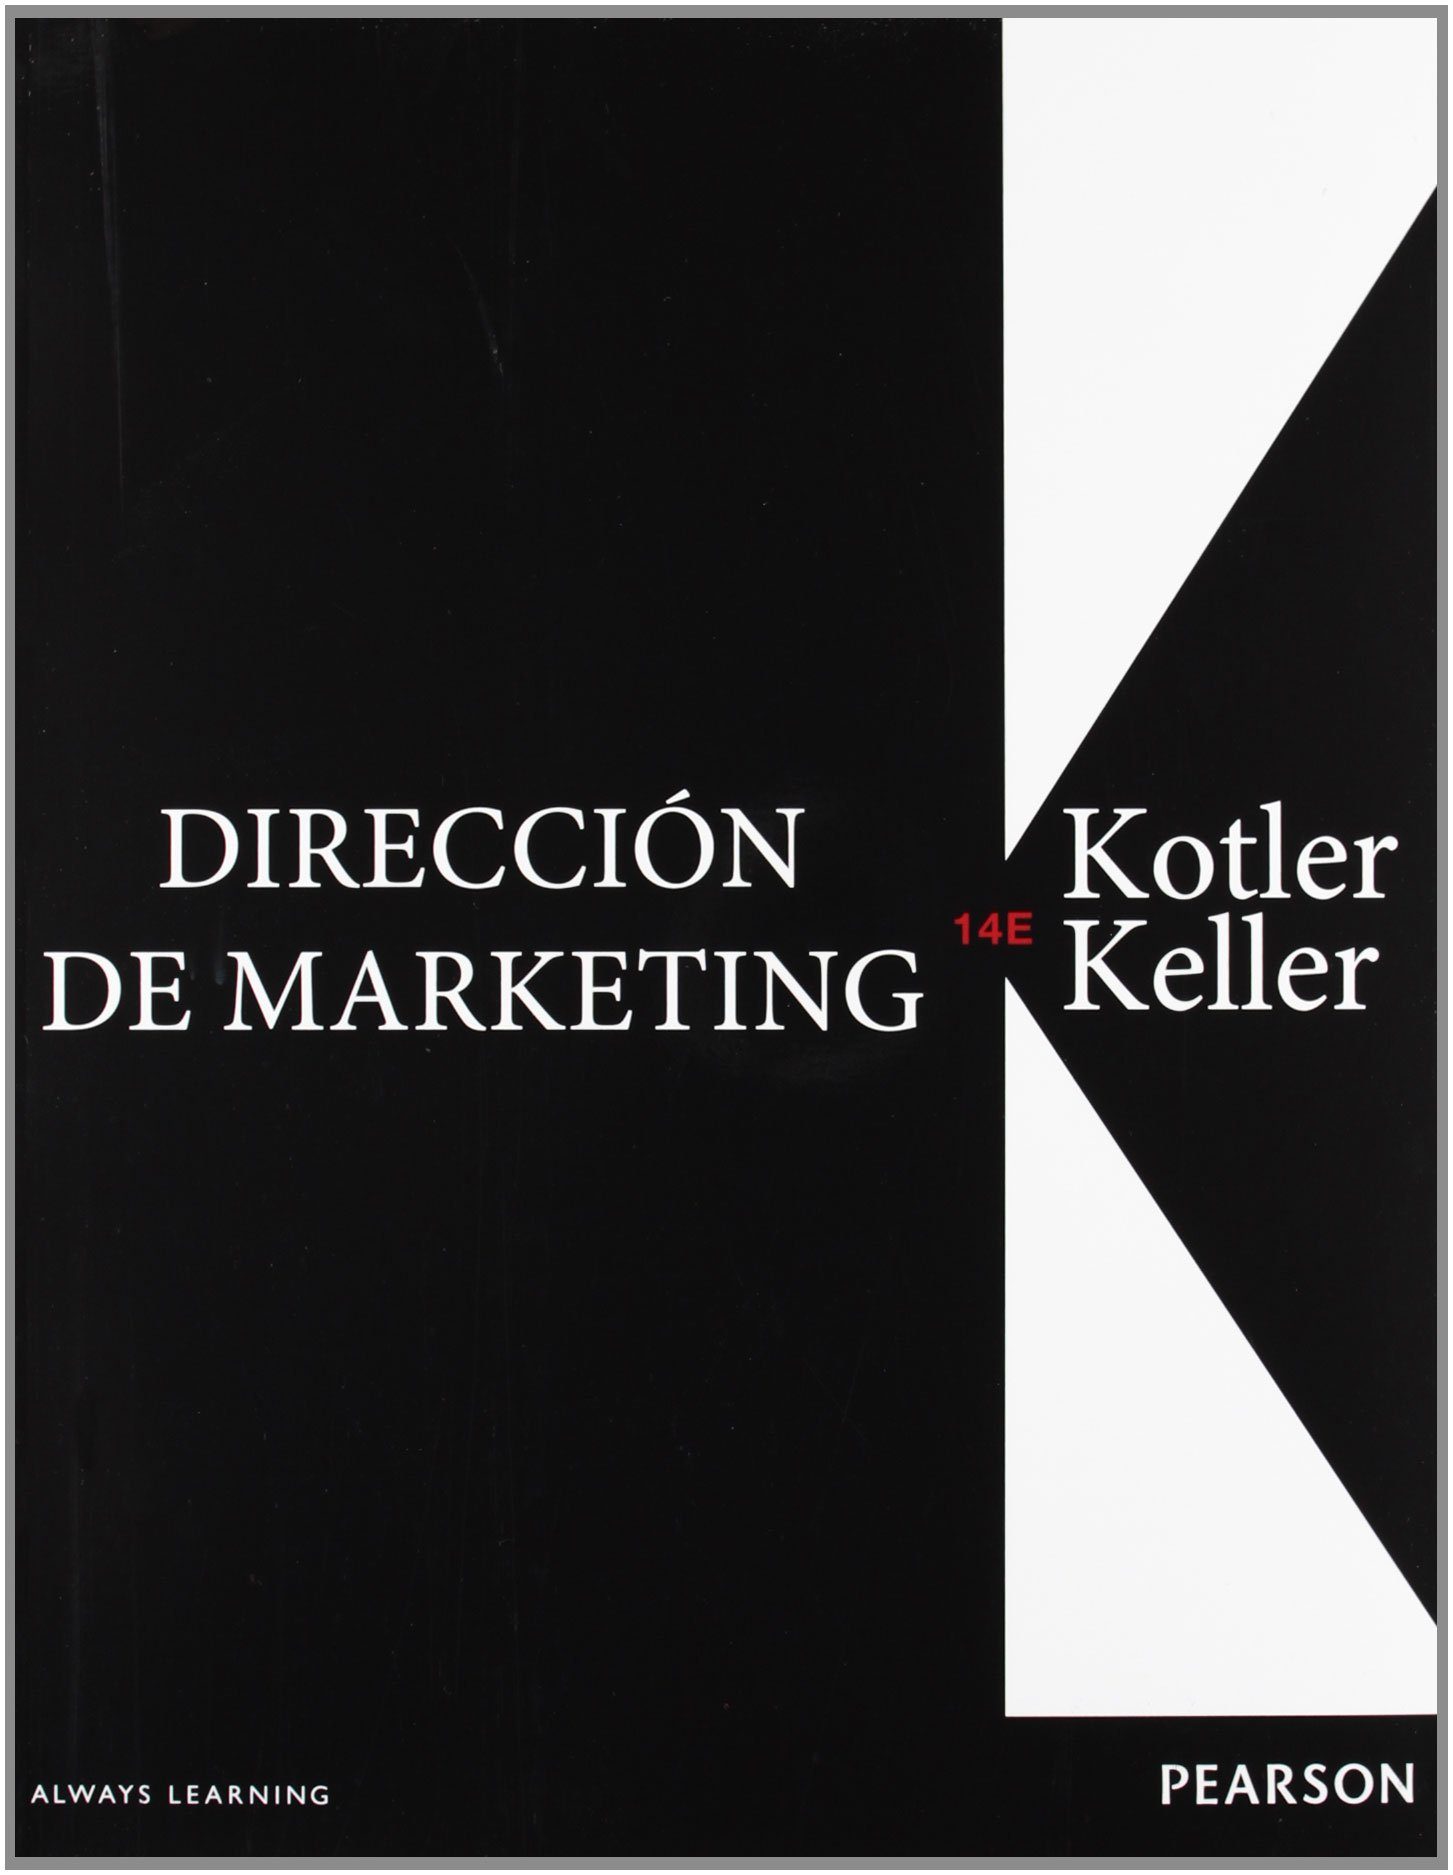 Direcci n de Marketing - Philip Kotler Kevin Lane Keller - Google Books